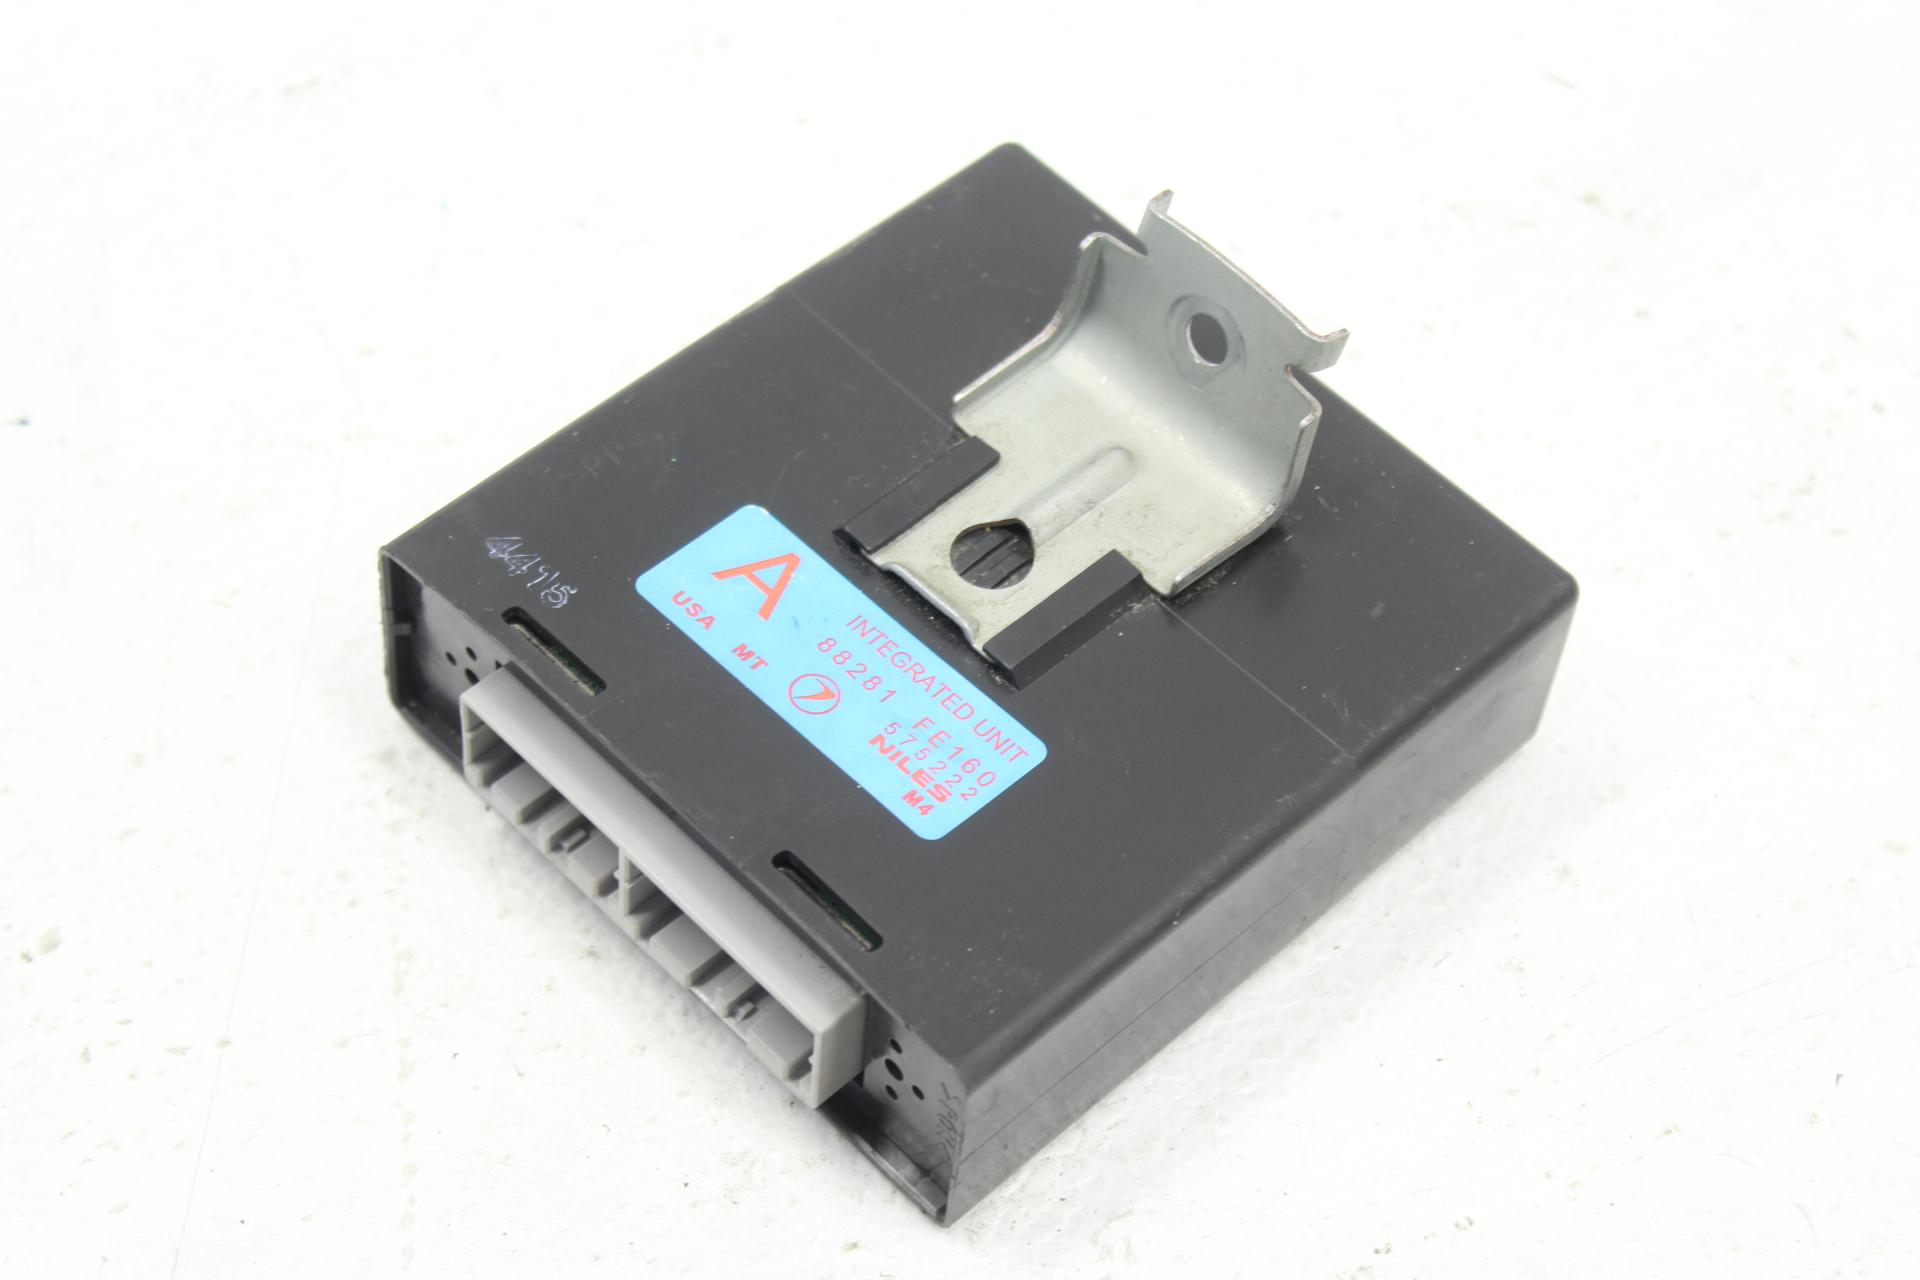 04 05 Subaru Impreza WRX STI Integrated Unit Module OEM 2004 2005